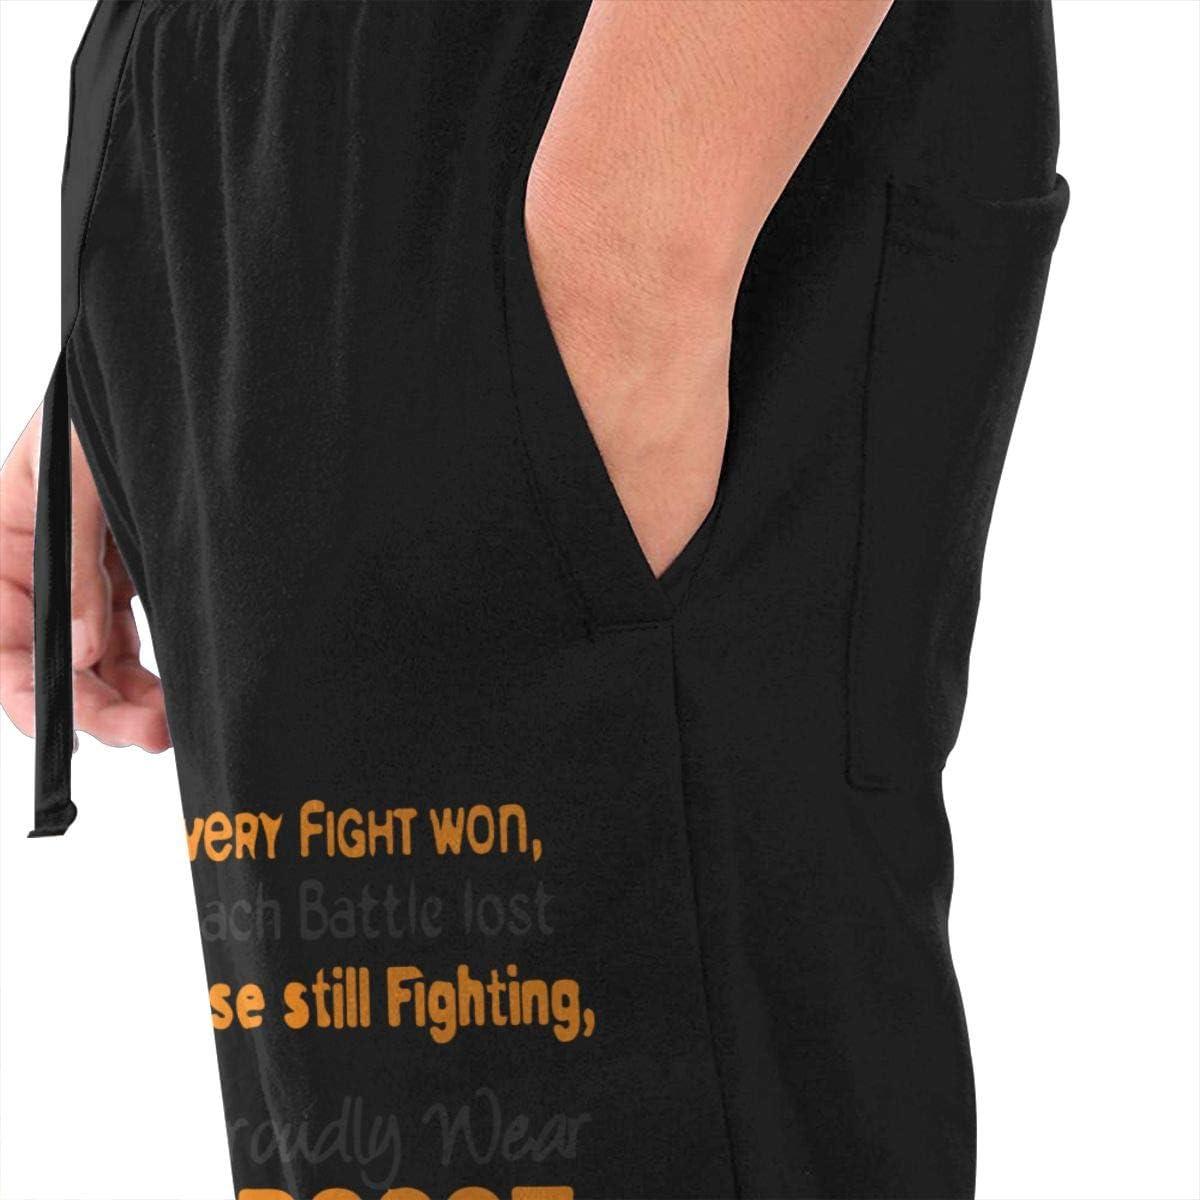 S-3XL Close Bottom Long Pants with Drawstring and Pockets Mens Leukemia Awareness Athletic Sweatpants